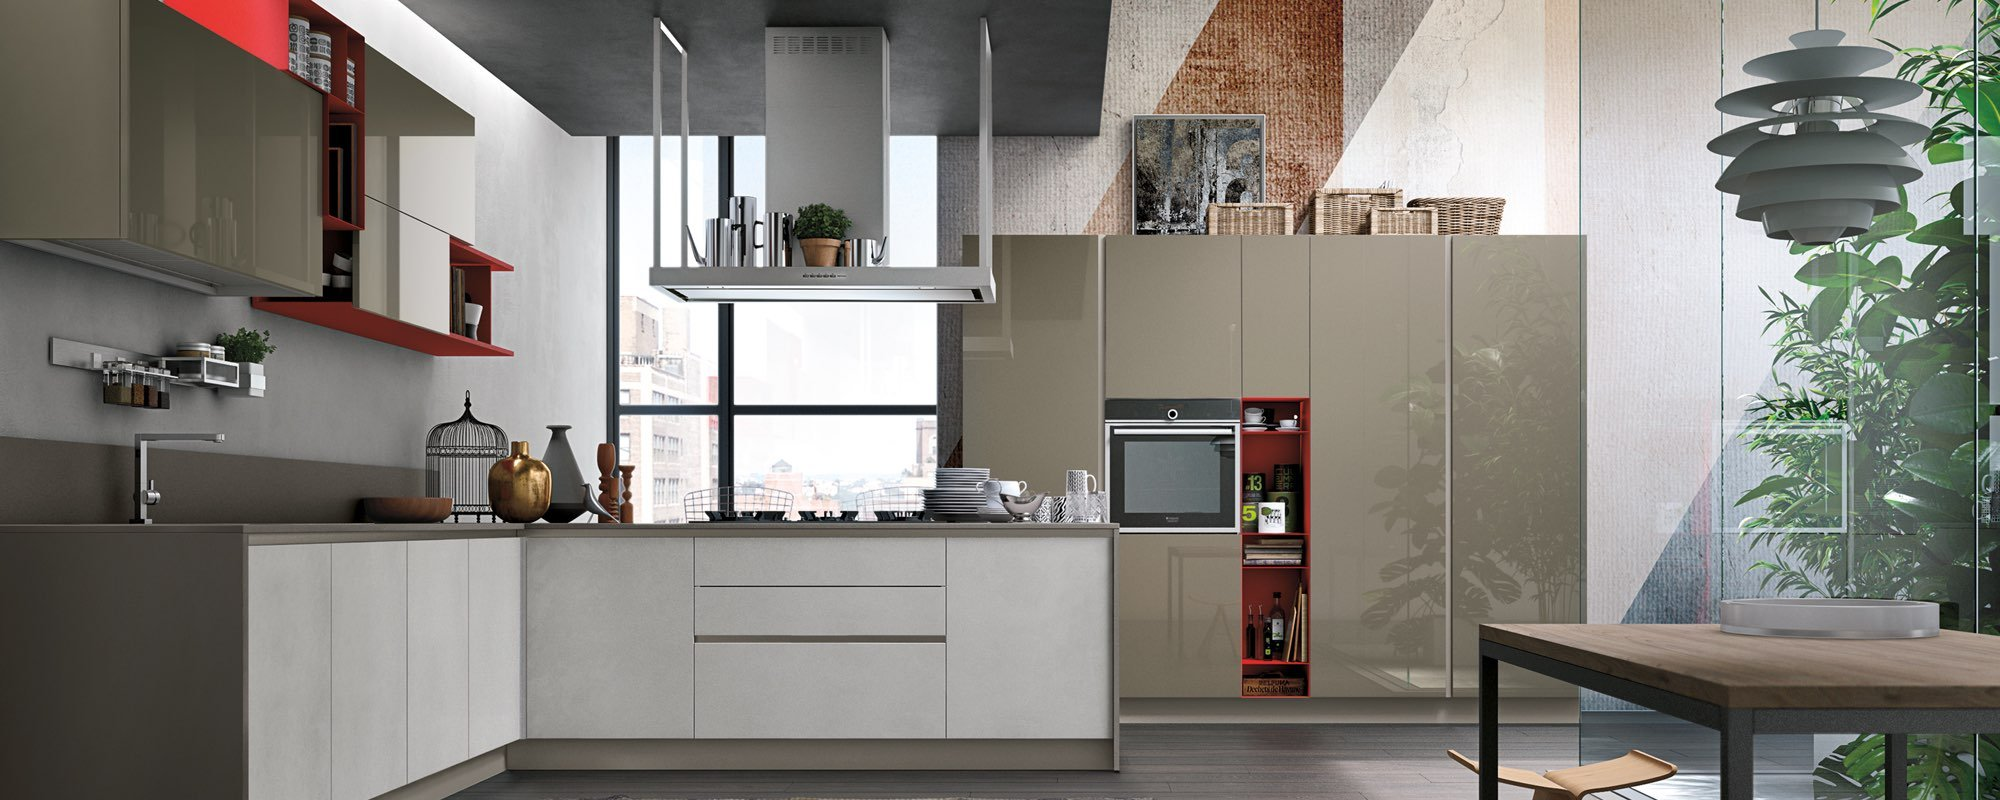 cucina con arredamento color bianco opaco